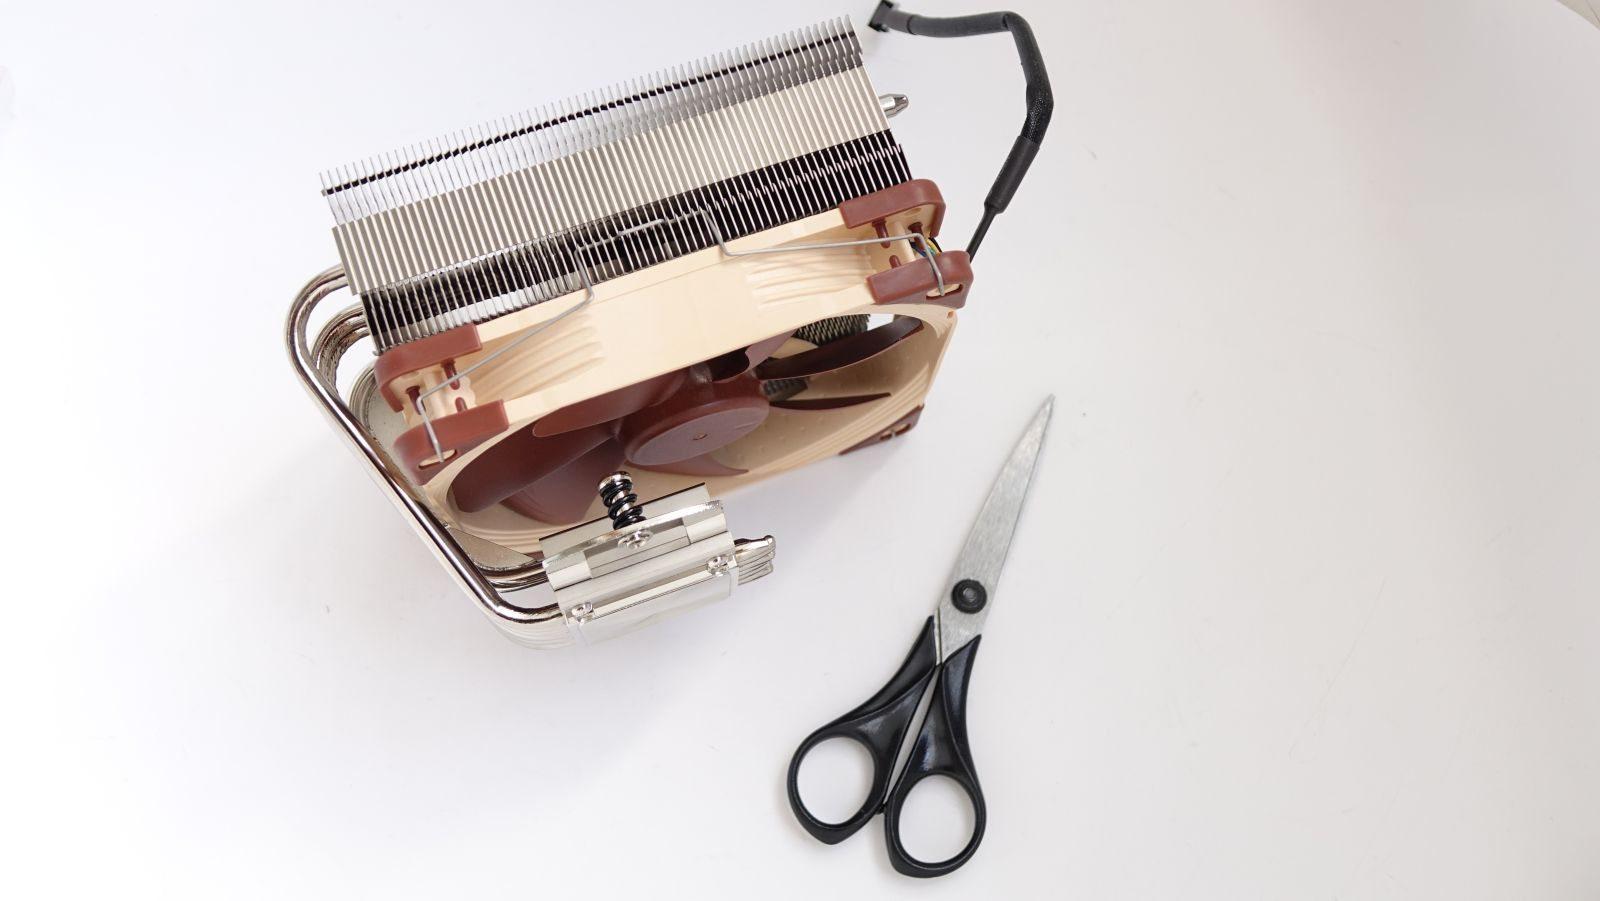 Noctua NH-C14S и ножницы